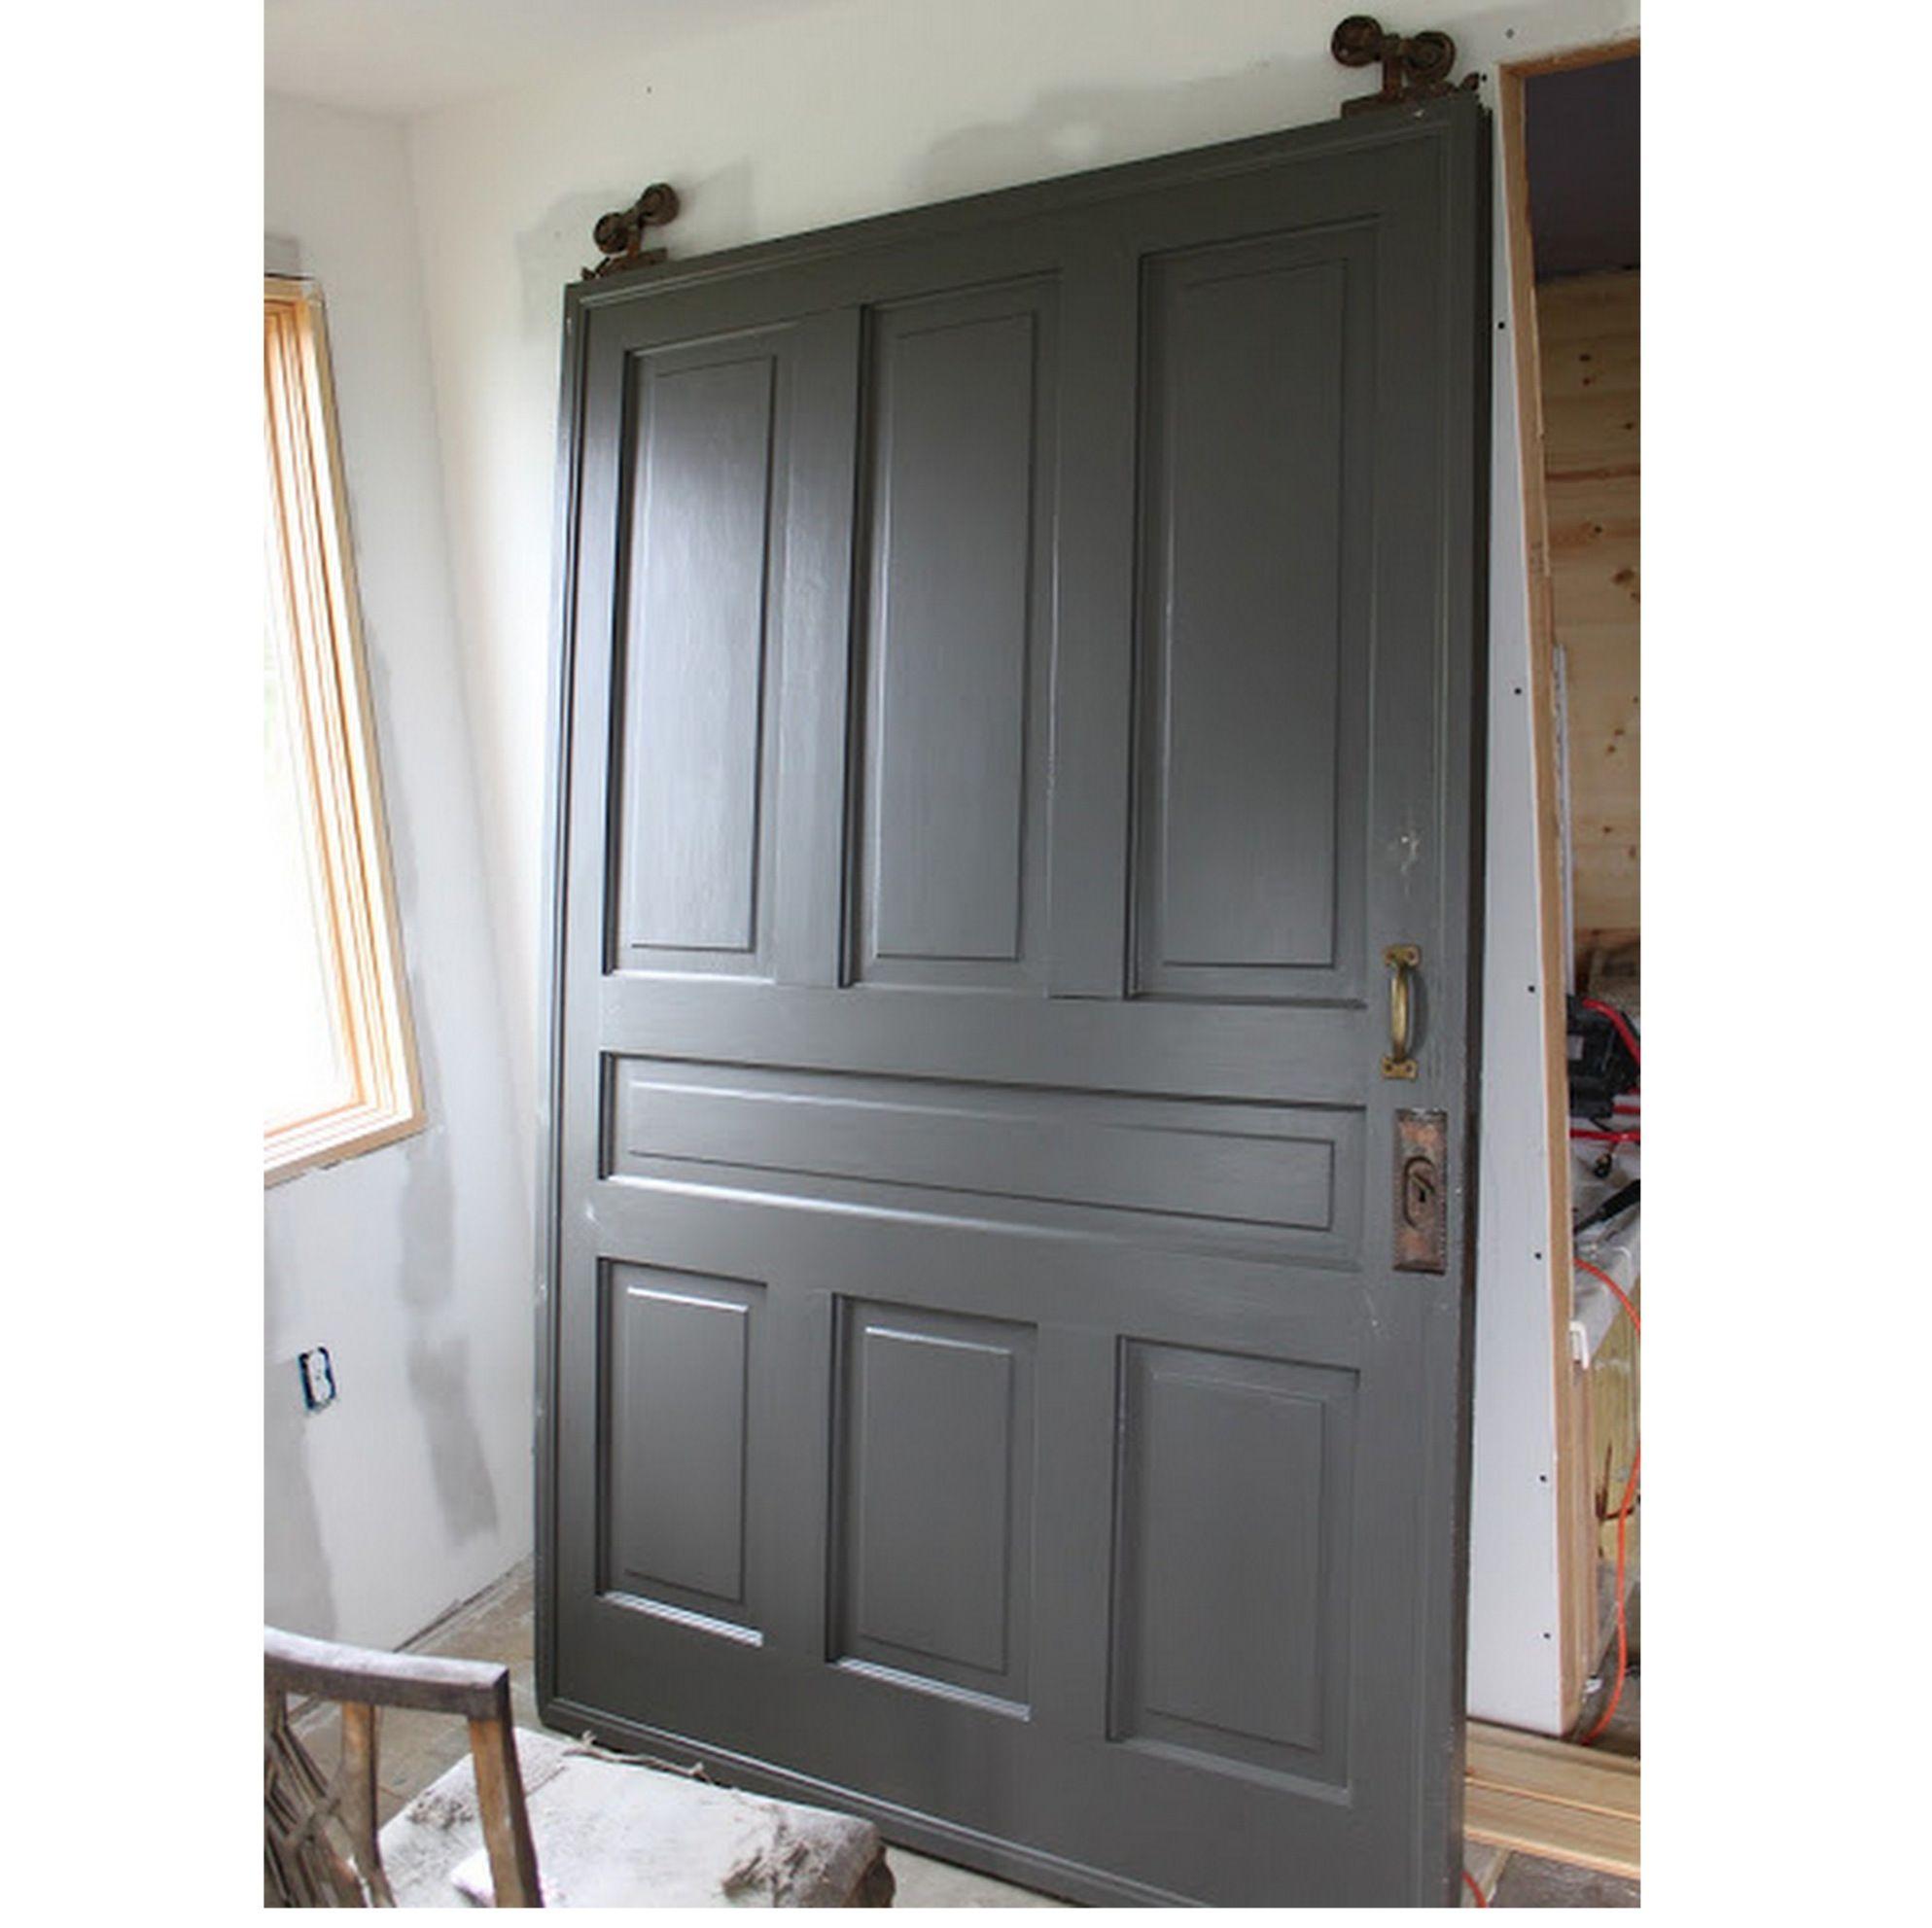 most popular benjamin moore paint colors interior door on most popular interior paint colors id=88111